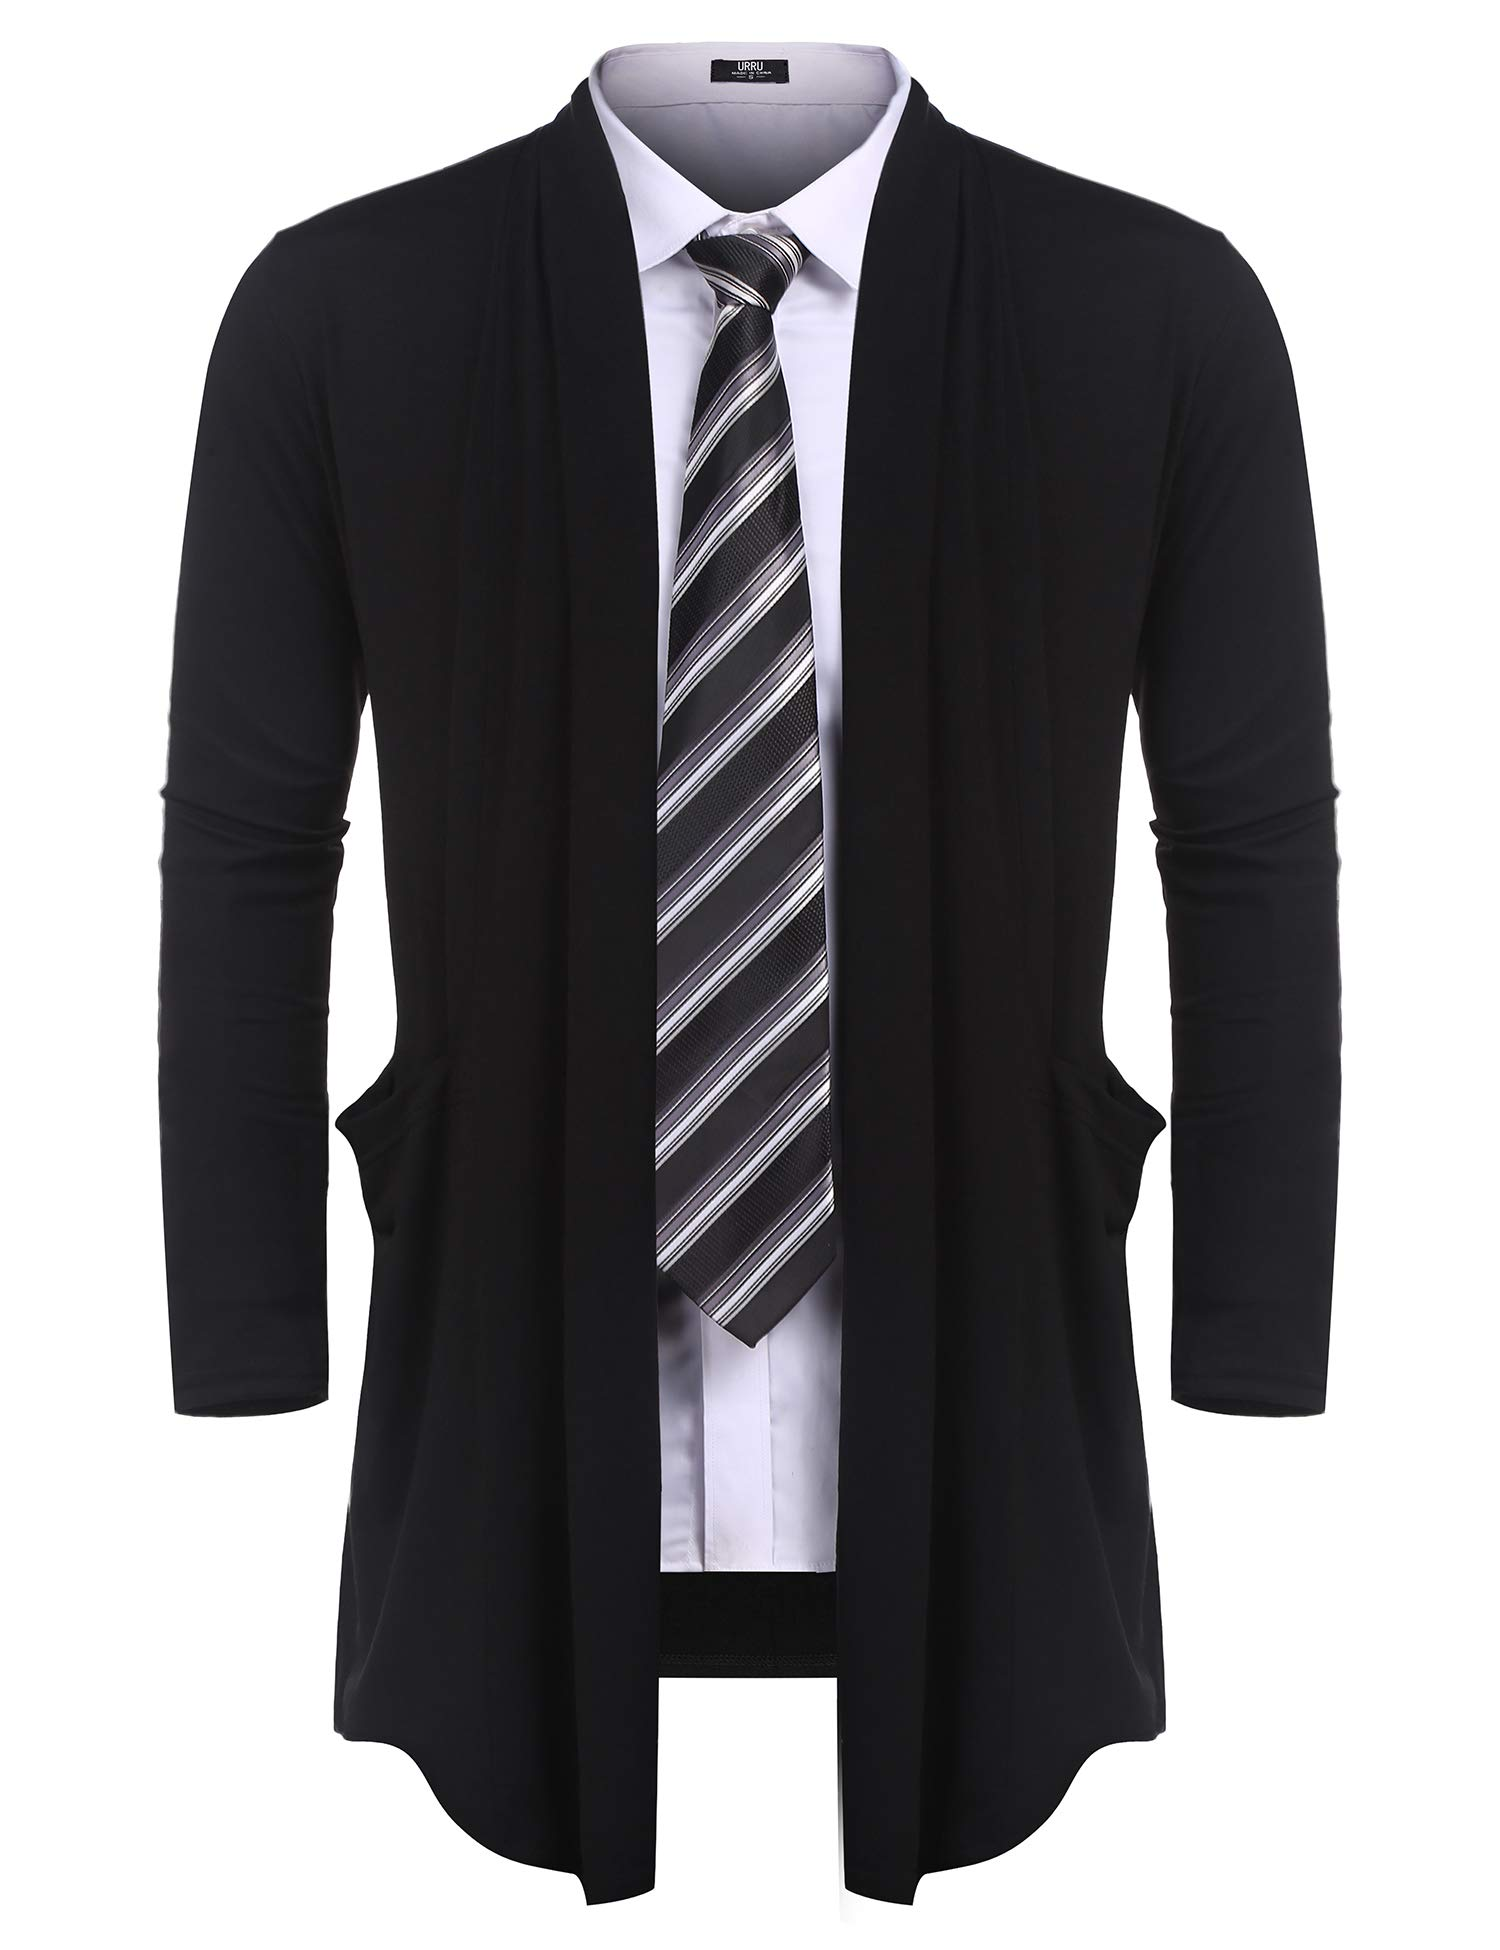 URRU Men's Ruffle Shawl Collar Cardigan Sweater Long Length Overcoat with Pockets S-XXL